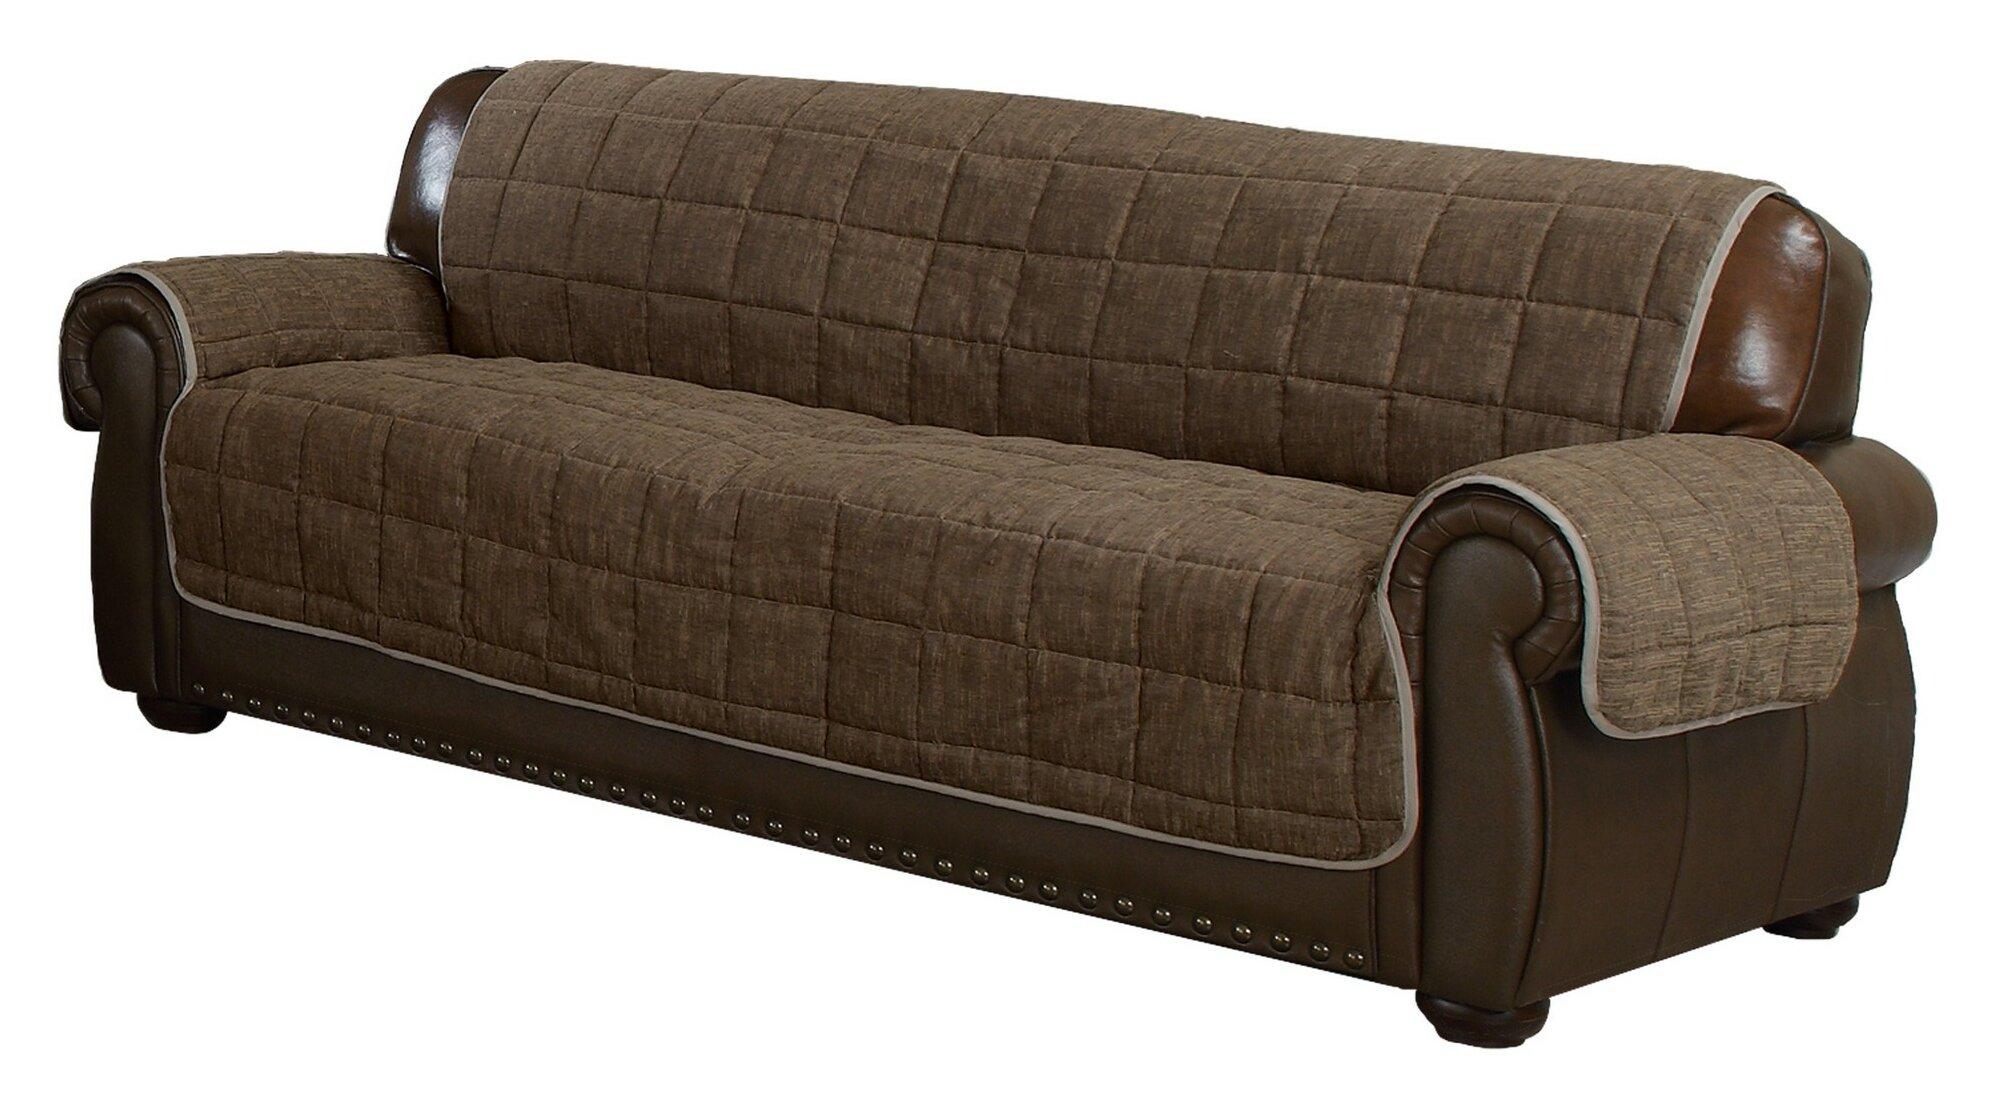 Red Barrel Studio Reversible Box Cushion Sofa Slipcover